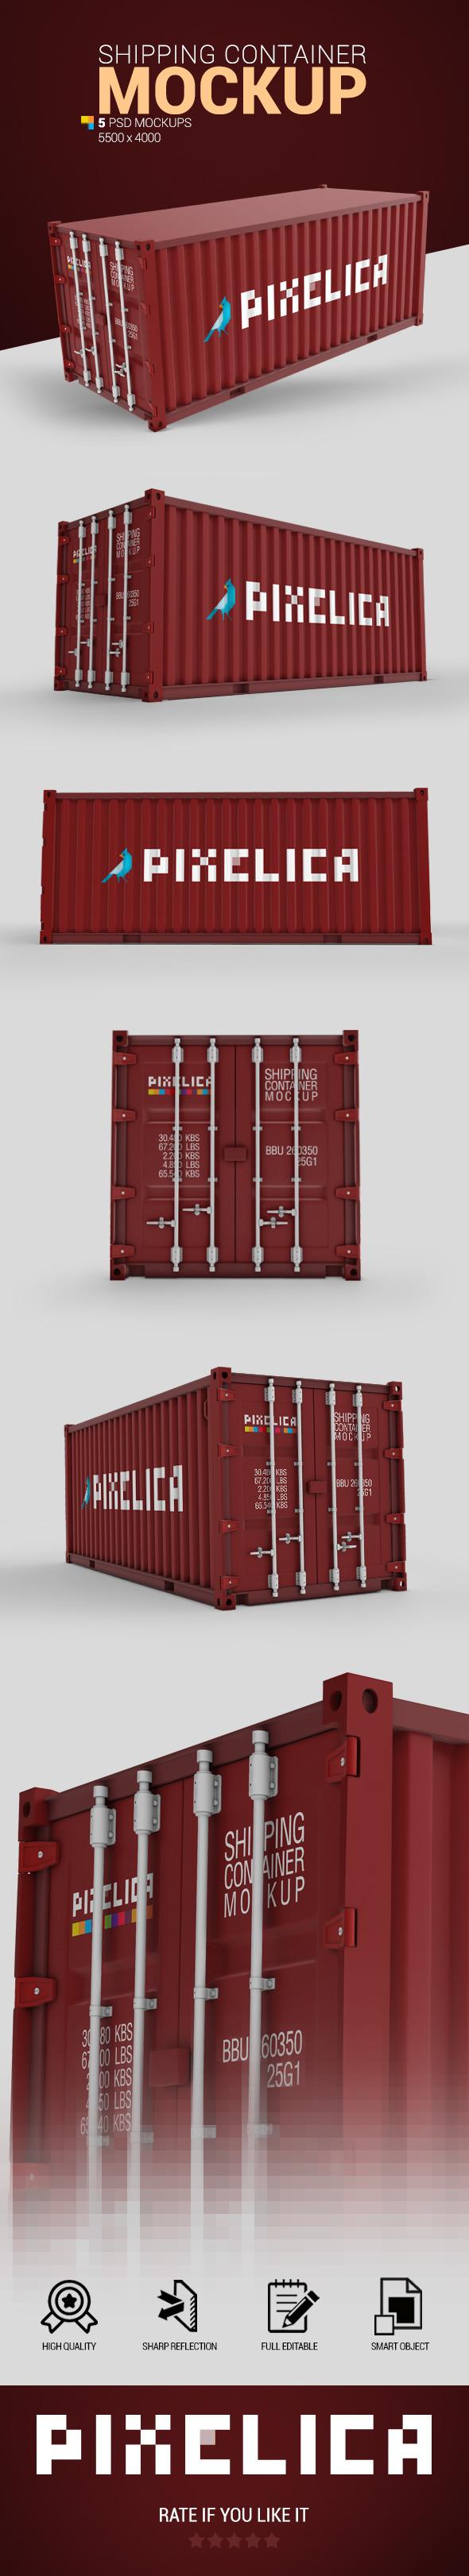 5款运输集装箱印花设计展示样机 Shipping Container Mockup插图